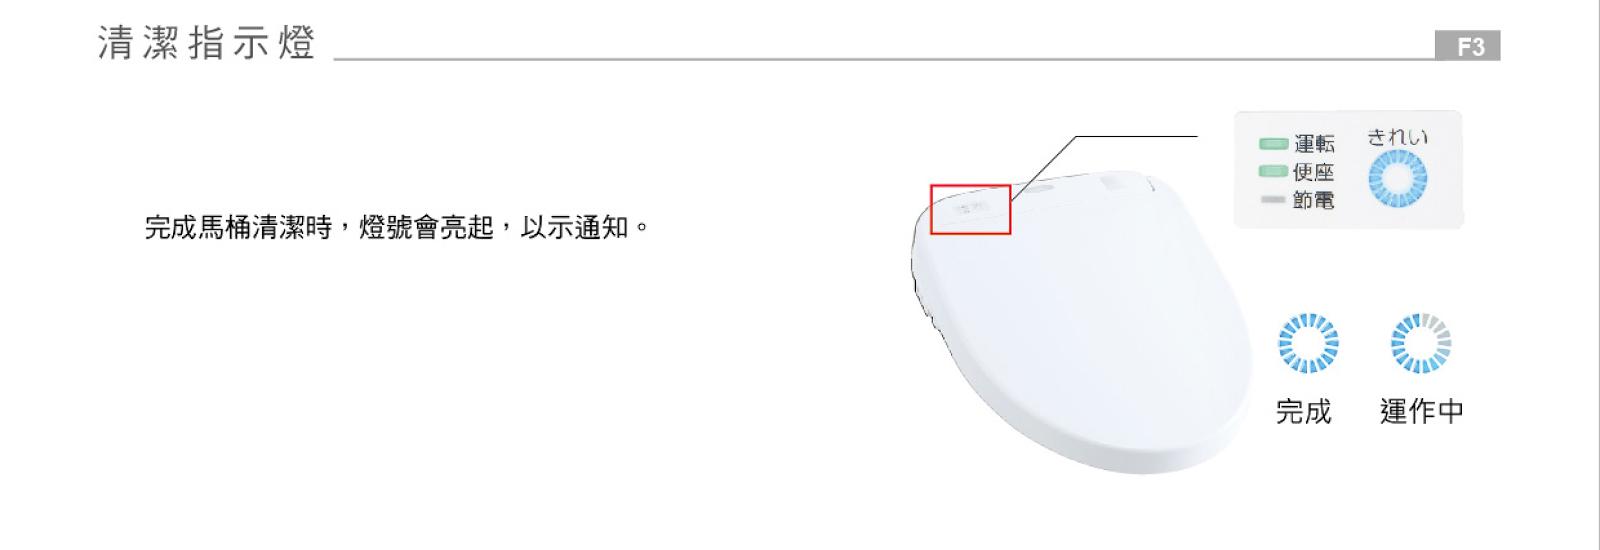 TOTO WASHLET 溫水洗淨便座(免治座) 介紹   宏騏 水電 材料 五金 維修